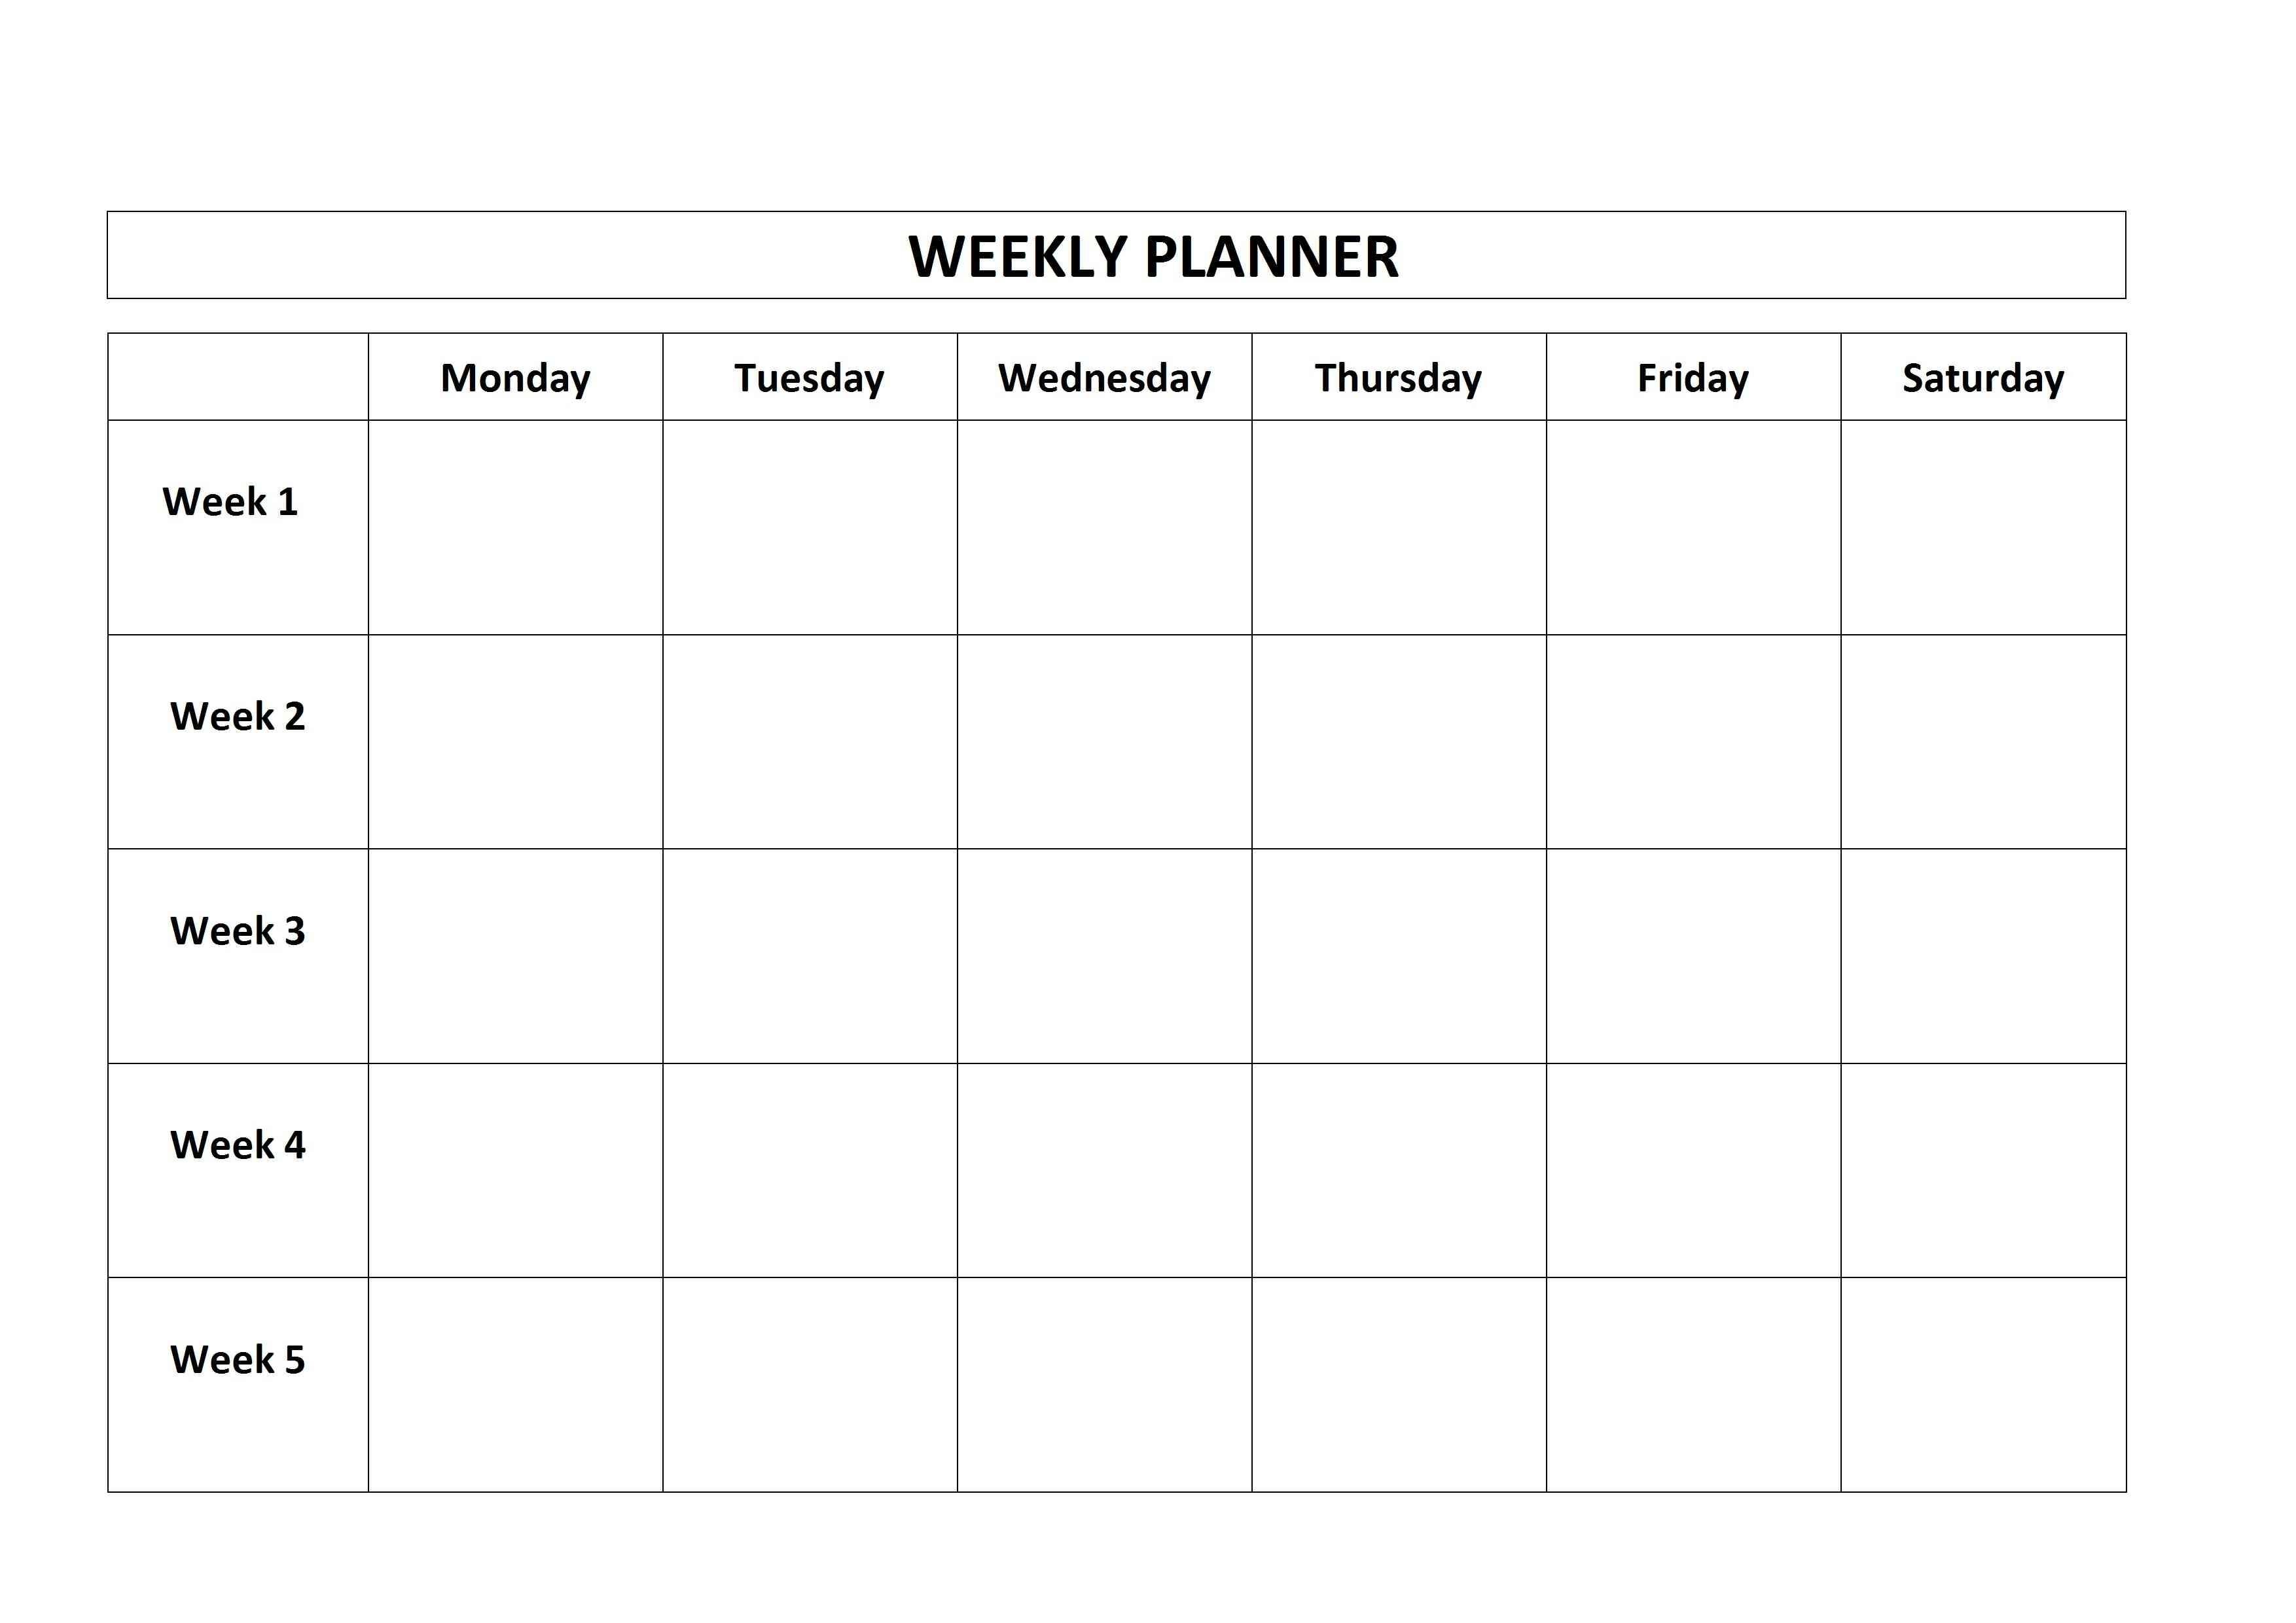 022 Two Week Calendar Template Blank Baskan Idai Co Within